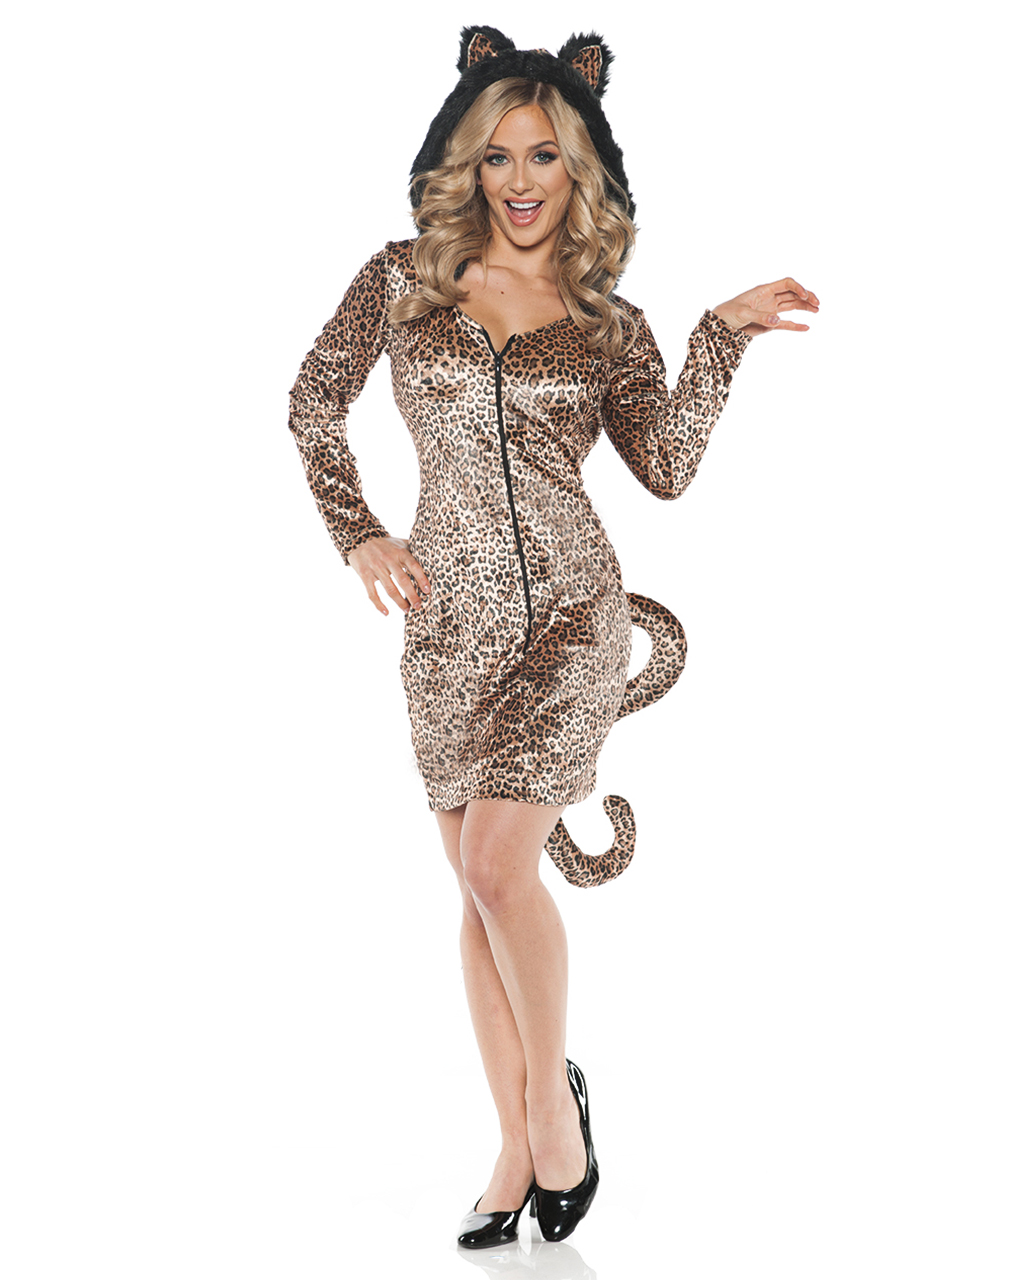 Leopard Kostüm Kleid für Karneval | Horror-Shop.com